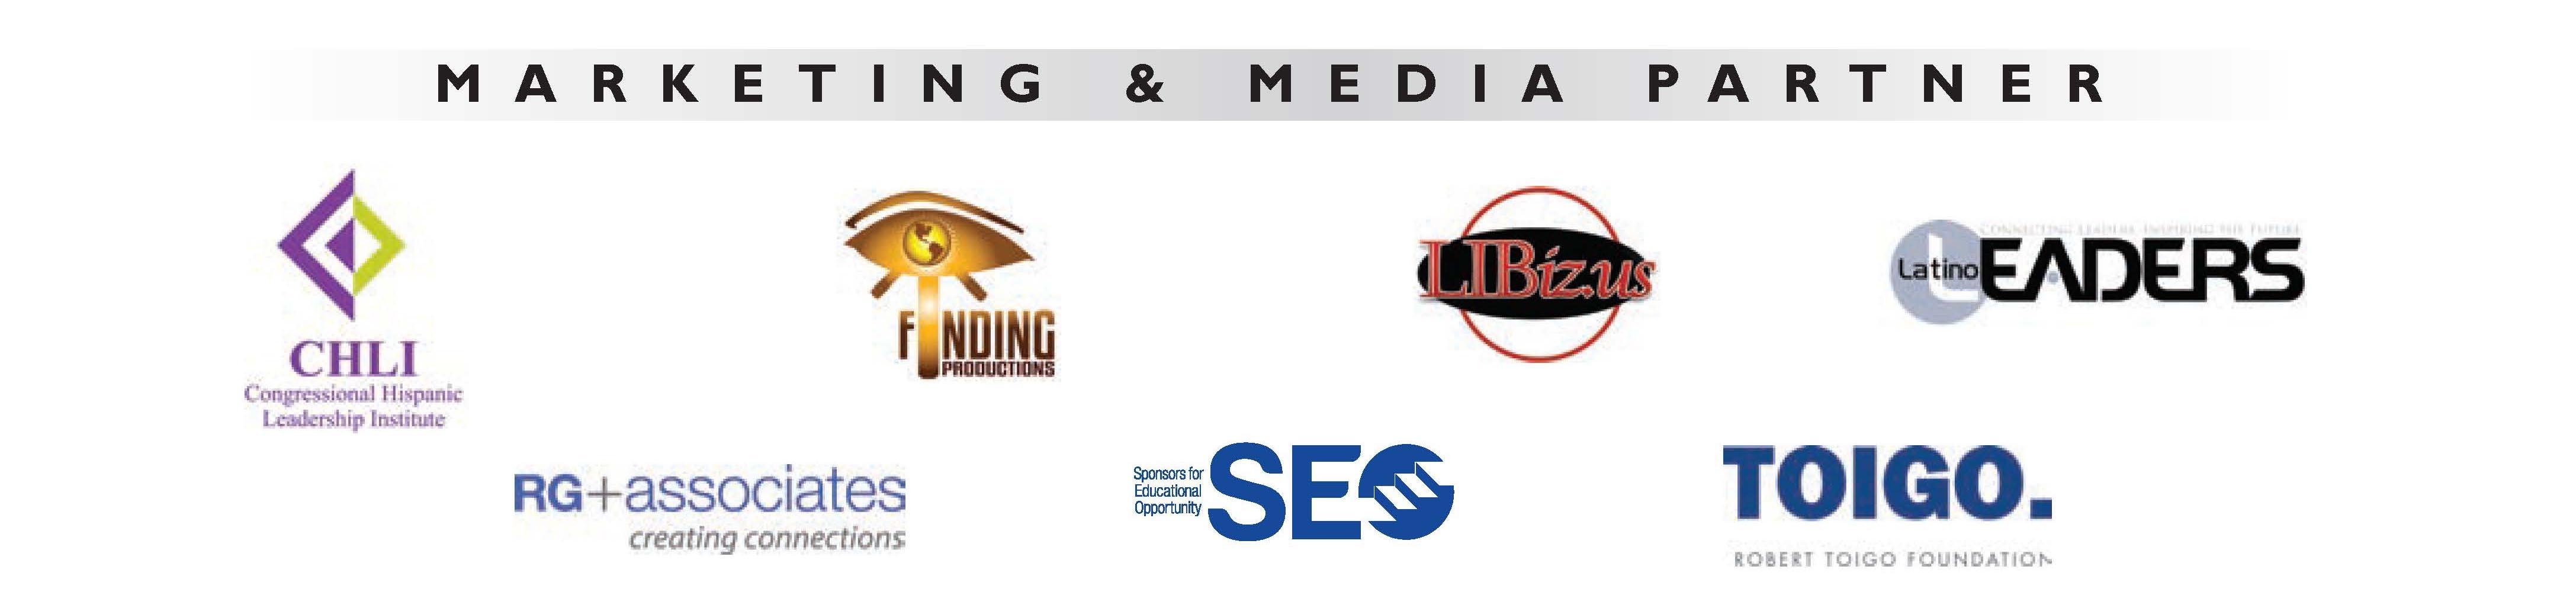 Summit_sponsors_!!c.jpg_marketing.jpg